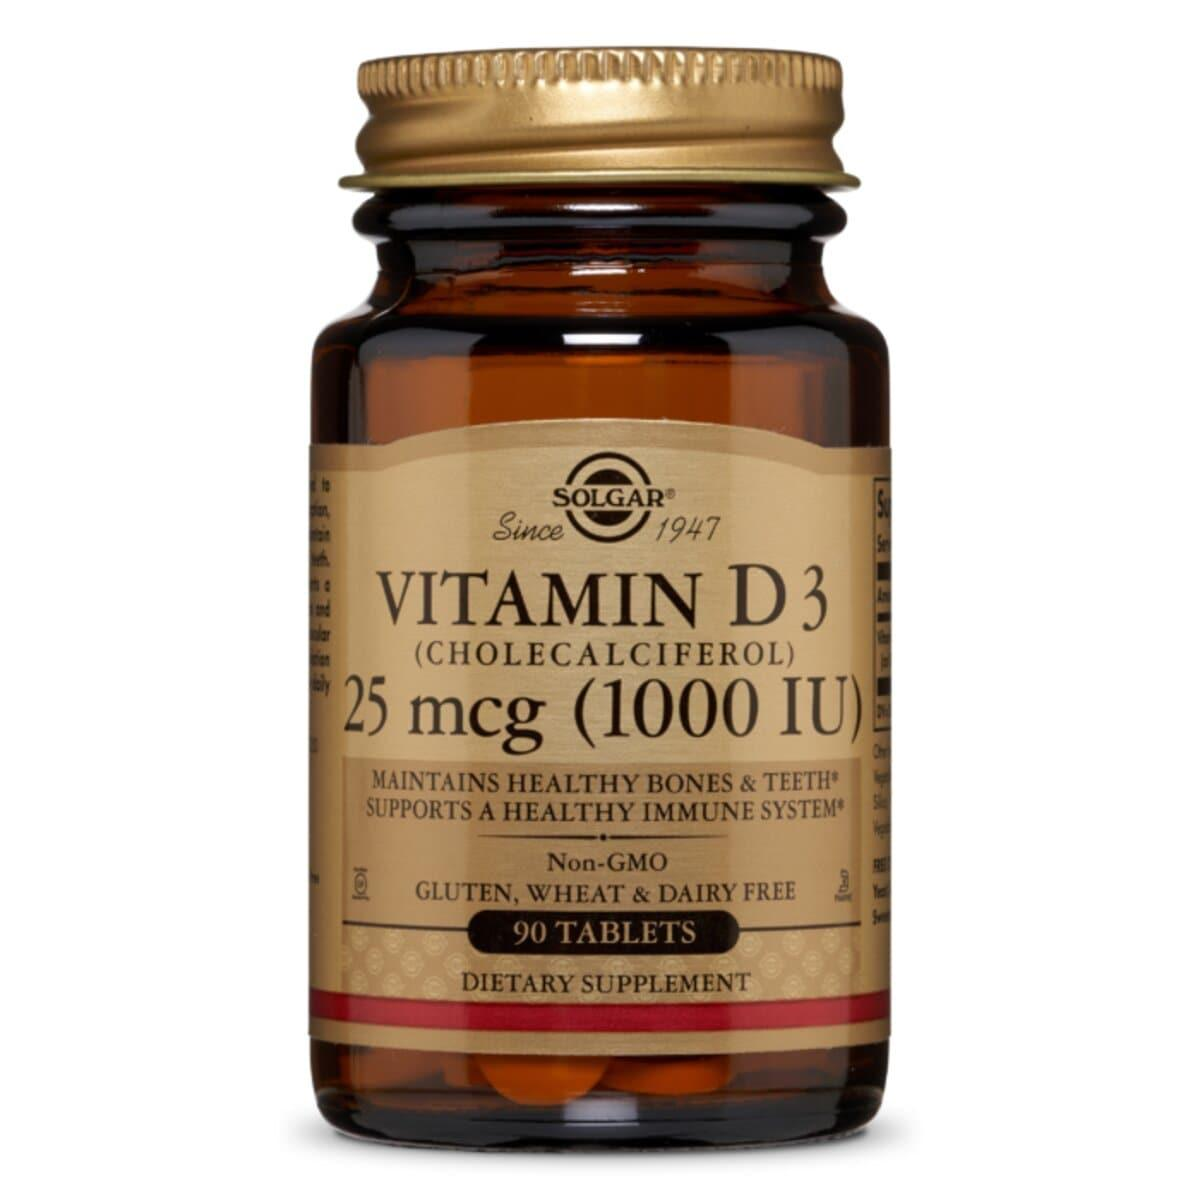 Витамин D3, Холекальциферол, Cholecalciferol, 25 мкг, 1000 МЕ, Solgar, 90 таблеток